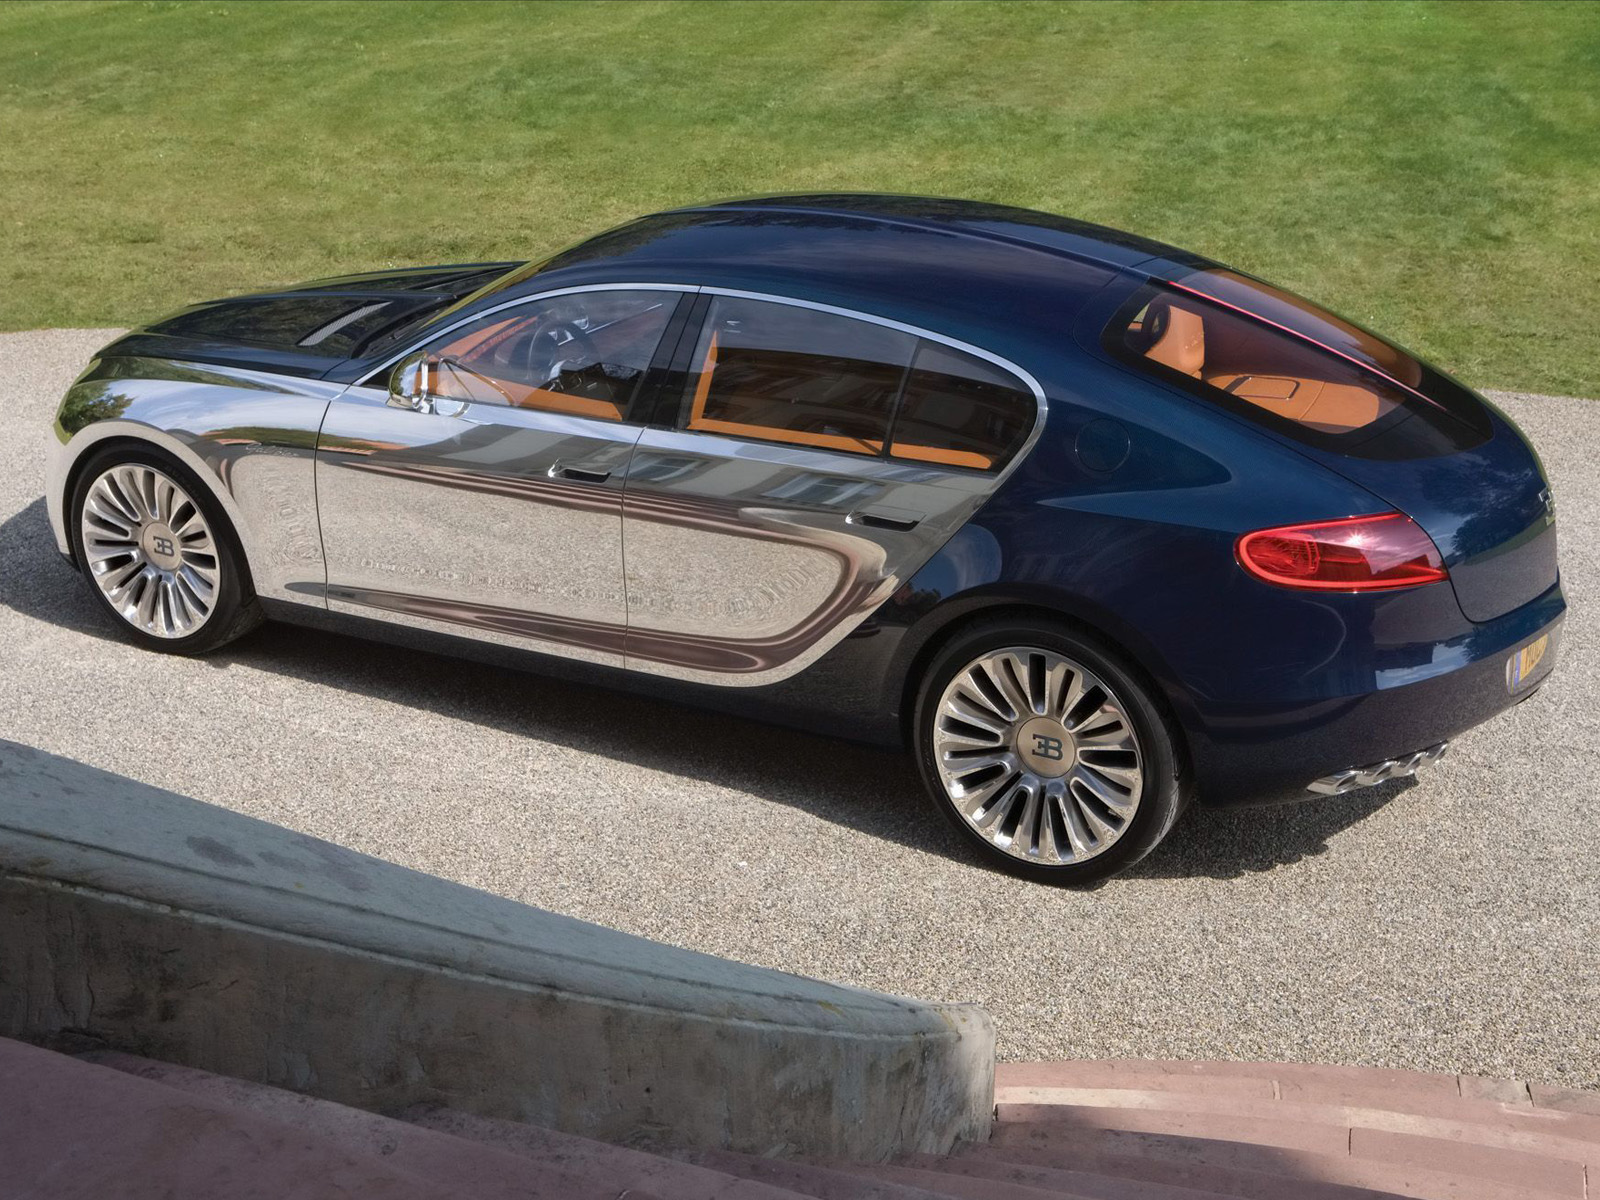 Incroyable Bugatti 16C Galibier